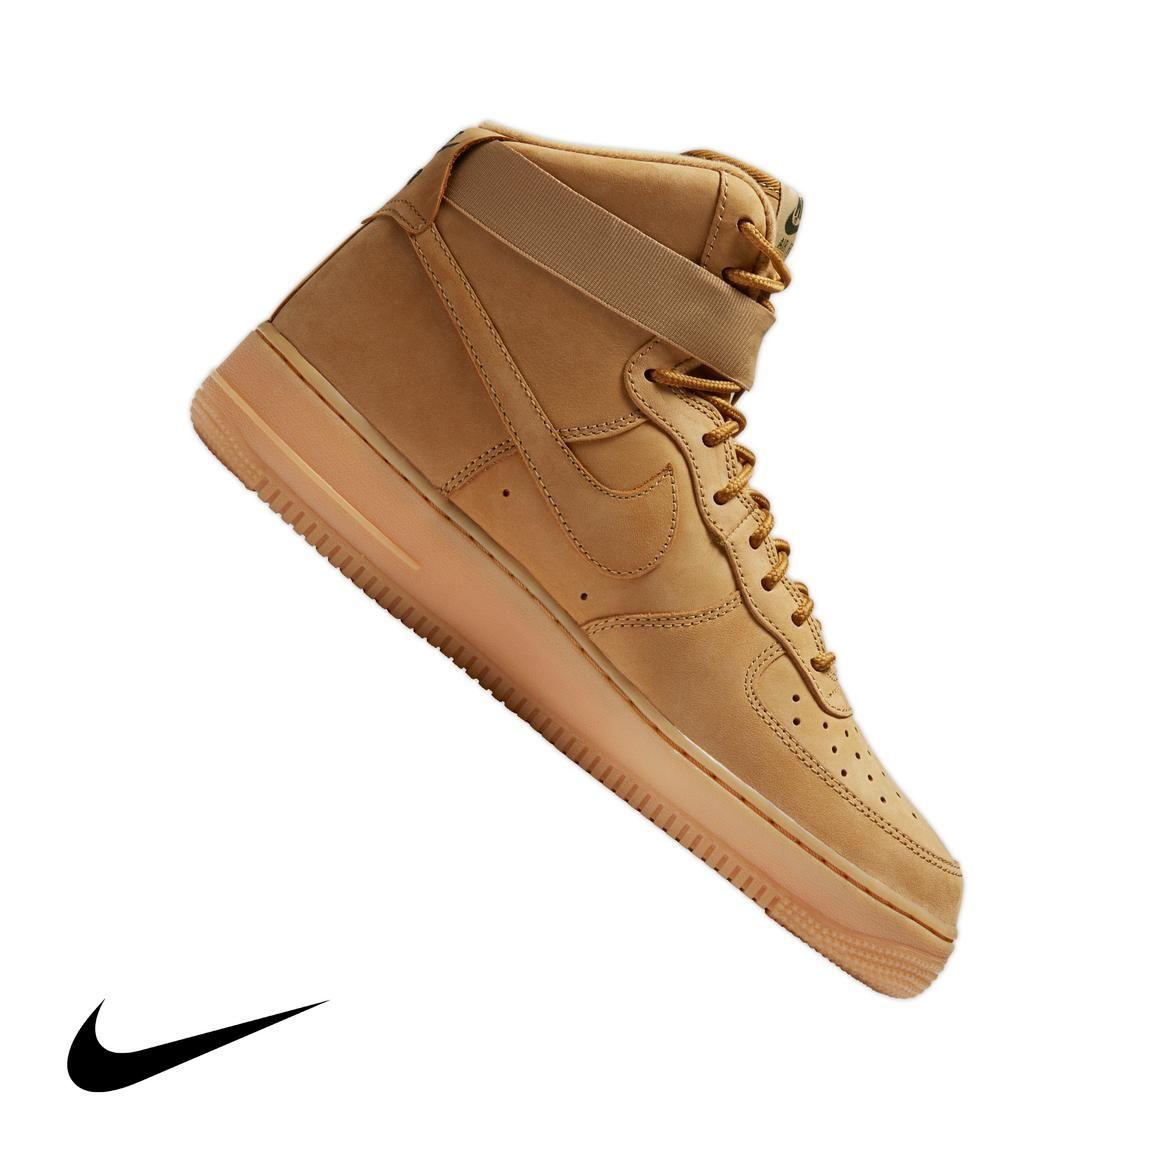 "Nike Air Force 1 High '07 LV8 WB ""Wheat"" Men's Basketball"